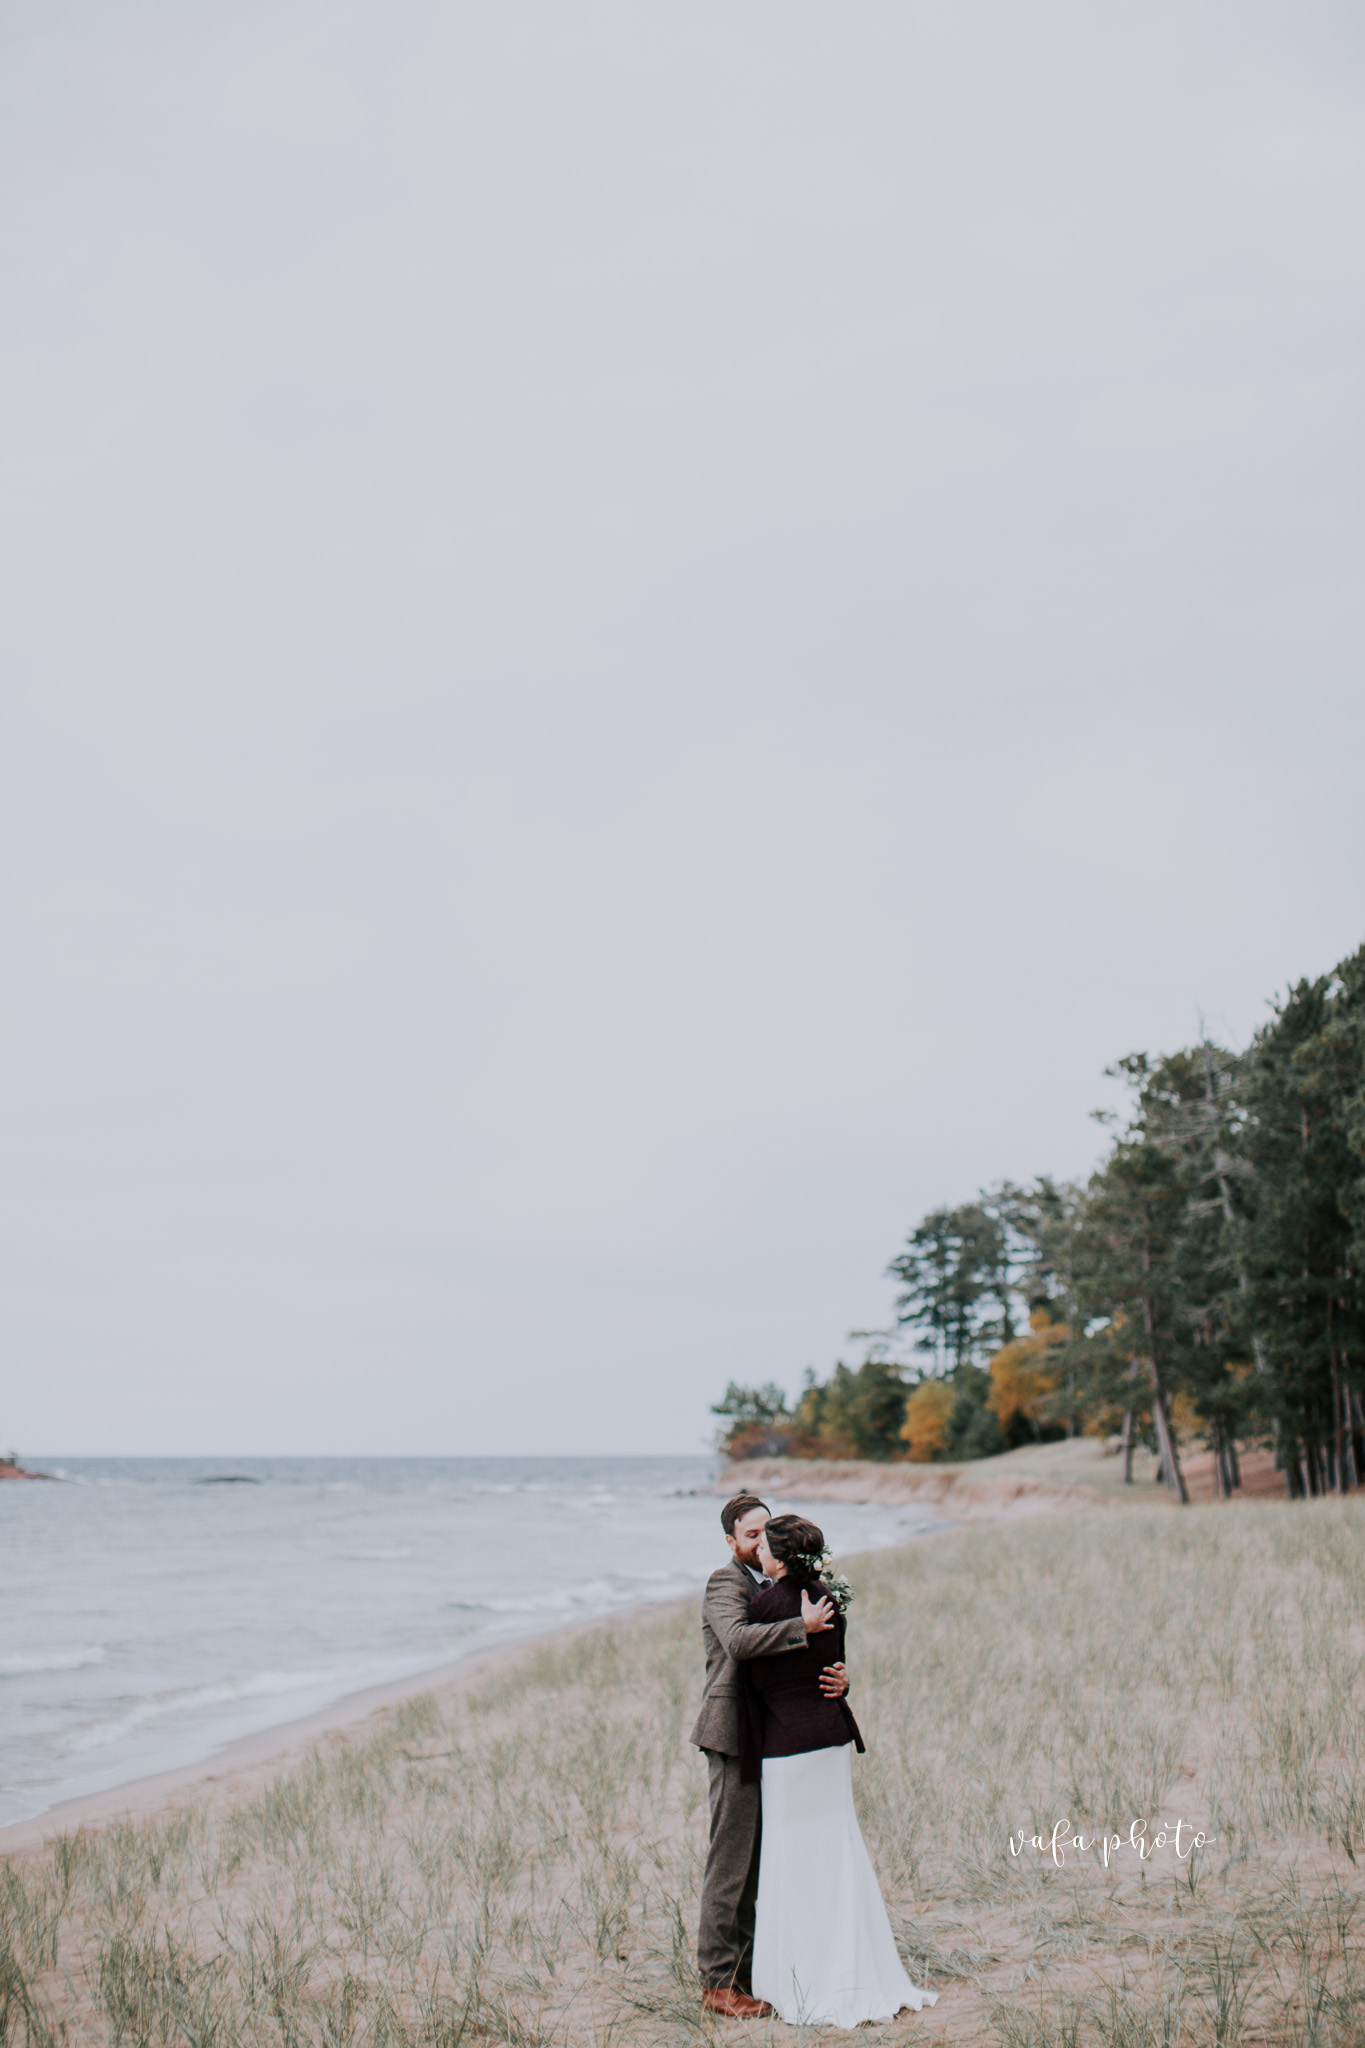 Little-Presque-Isle-Michigan-Wedding-Kim-Kyle-Vafa-Photo-446.jpg